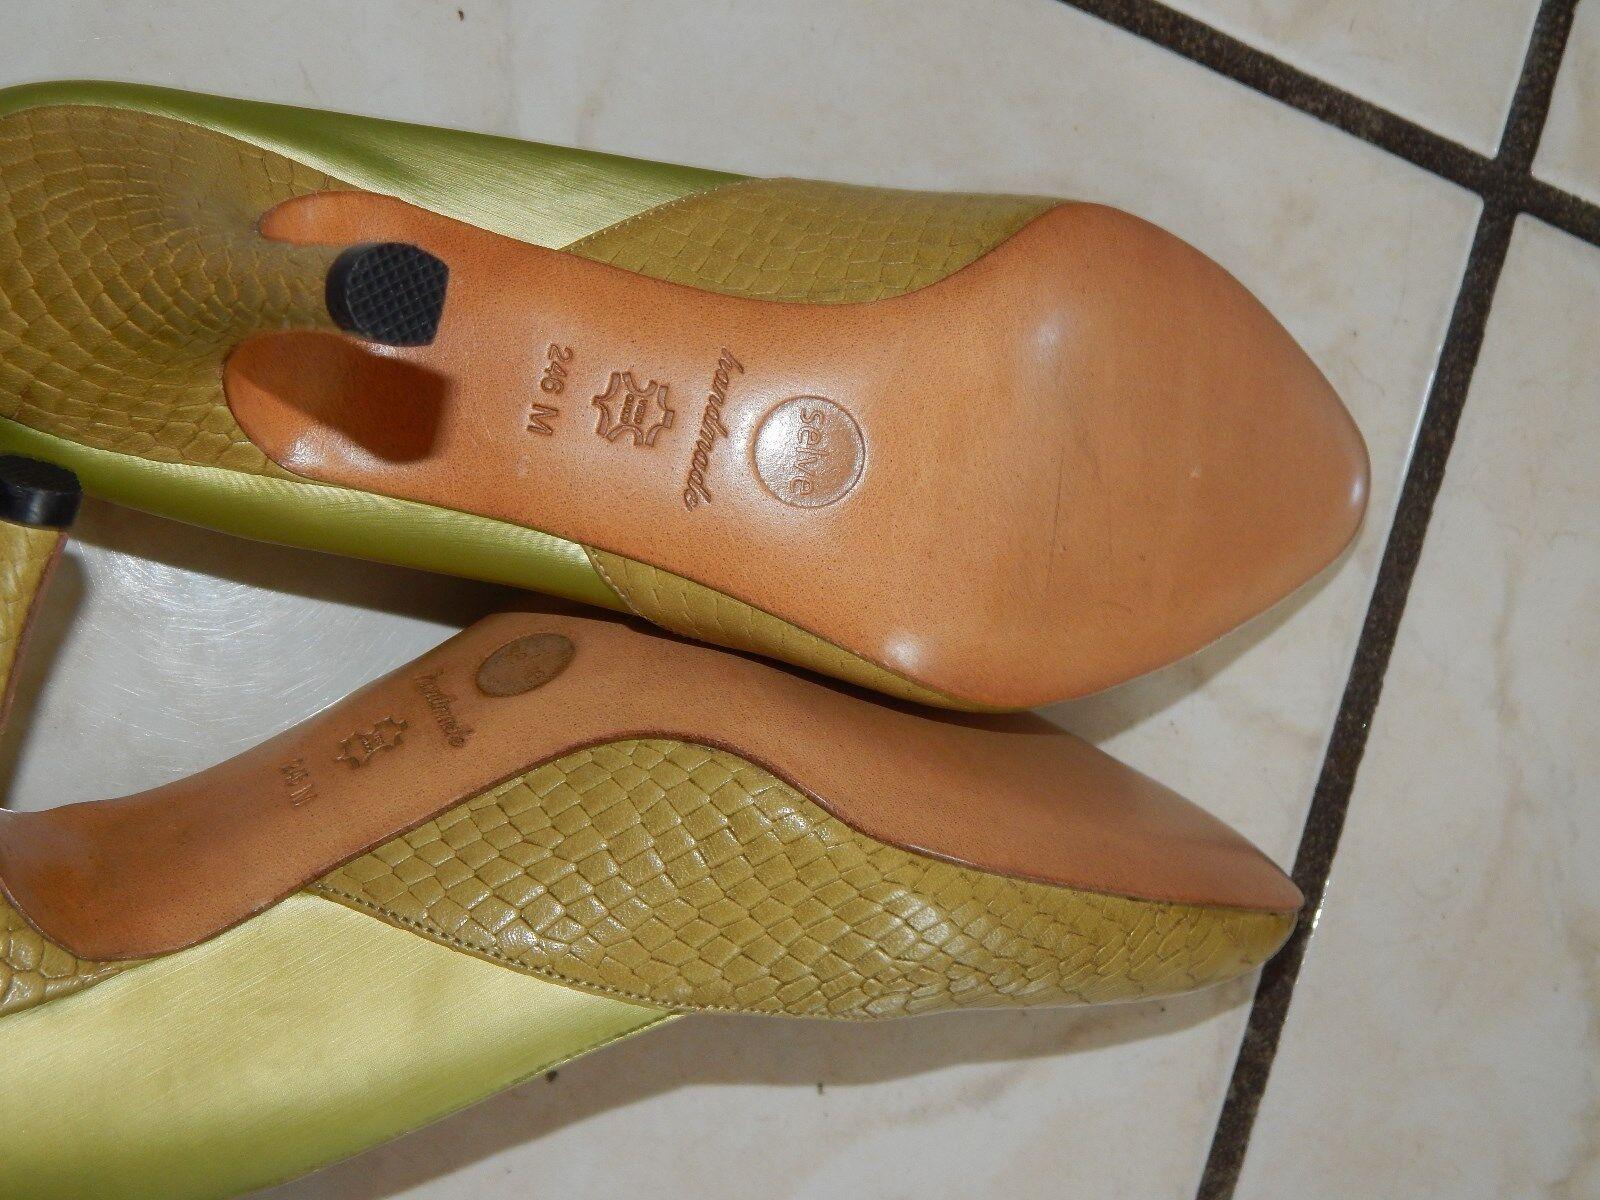 SELVE Loafers Mokassins Ballerinas Halbschuhe Ballerinas Mokassins Handmade Gr. 38,5   Echt Leder (7) 7875c3